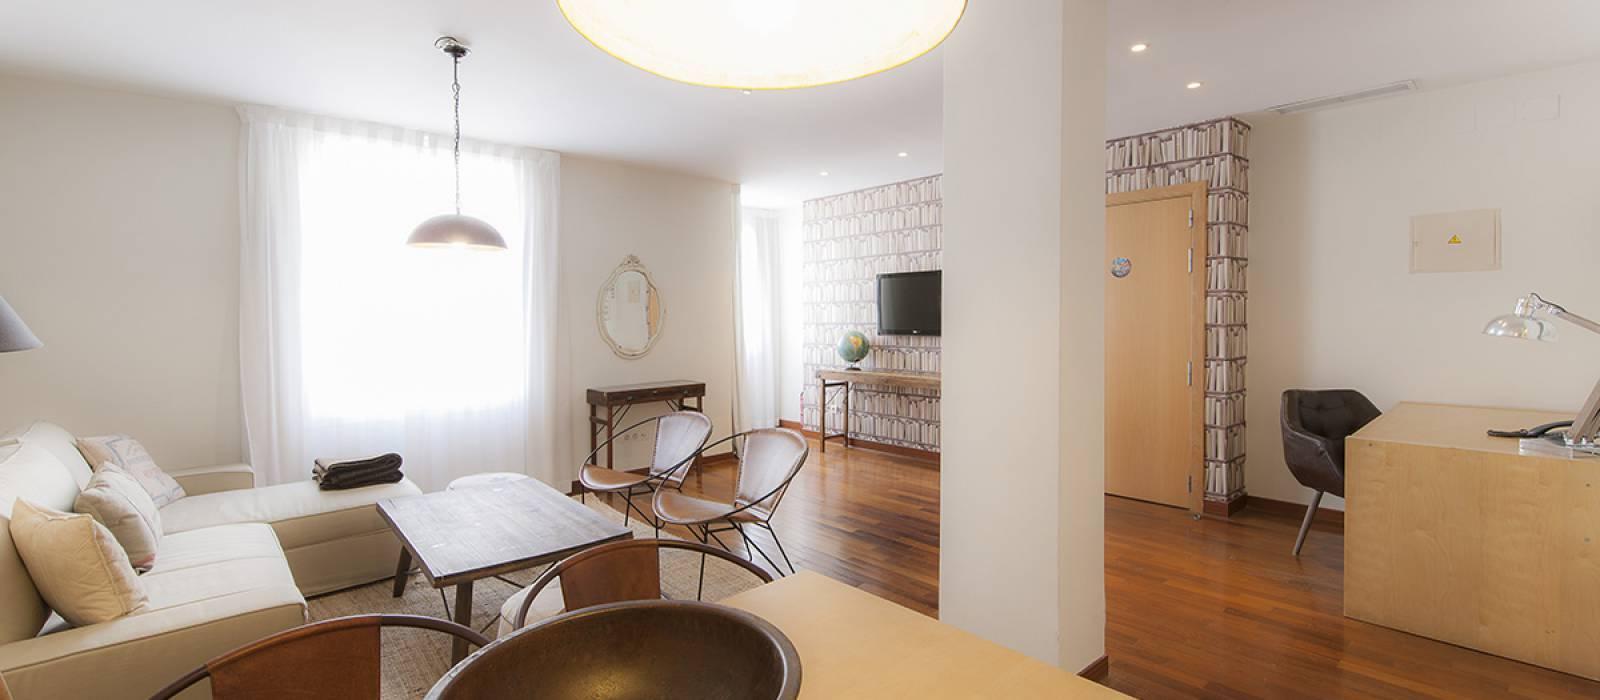 Rooms Hotel Soma Madrid - Vincci Hotels - Vincci Apartment